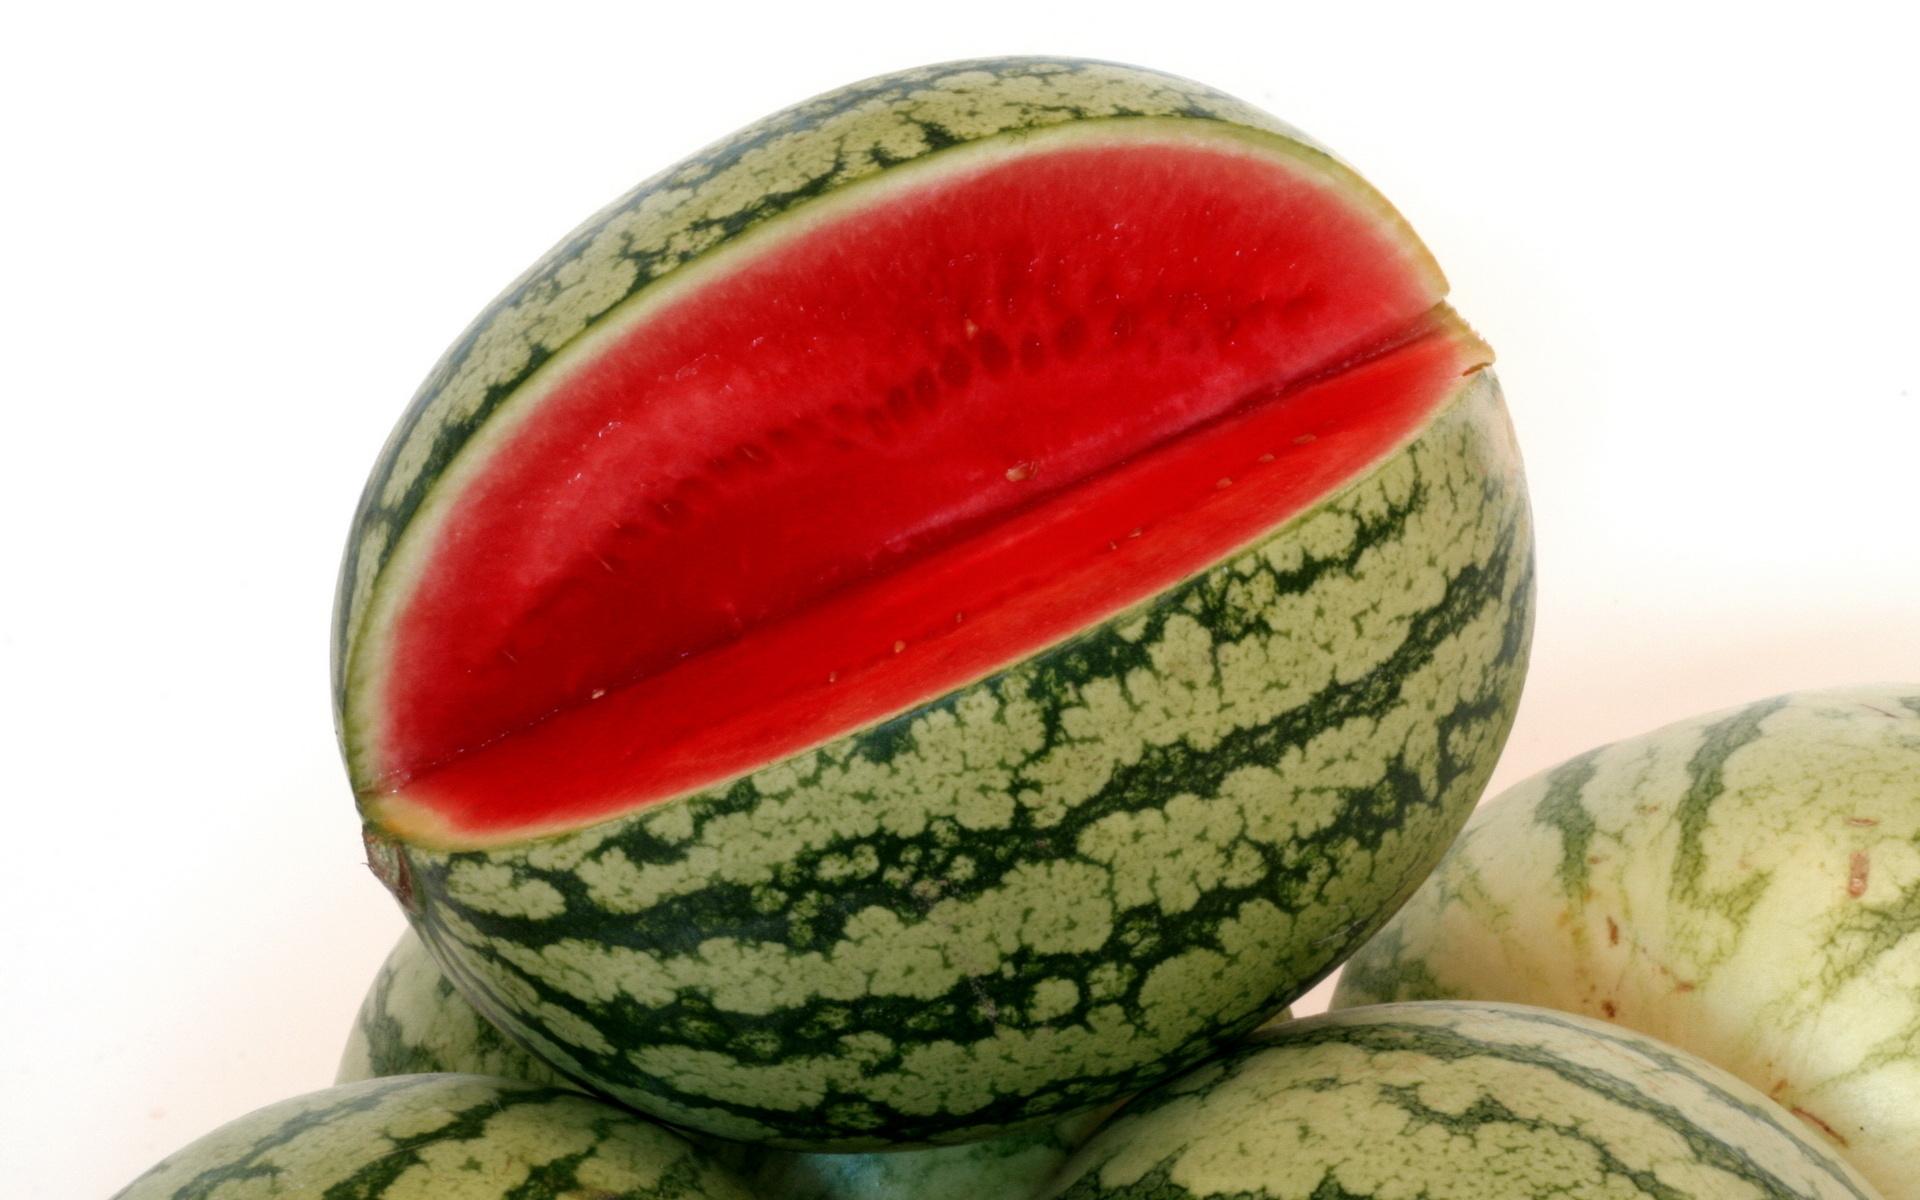 Watermelon · Watermelon · Watermelon · Watermelon ...